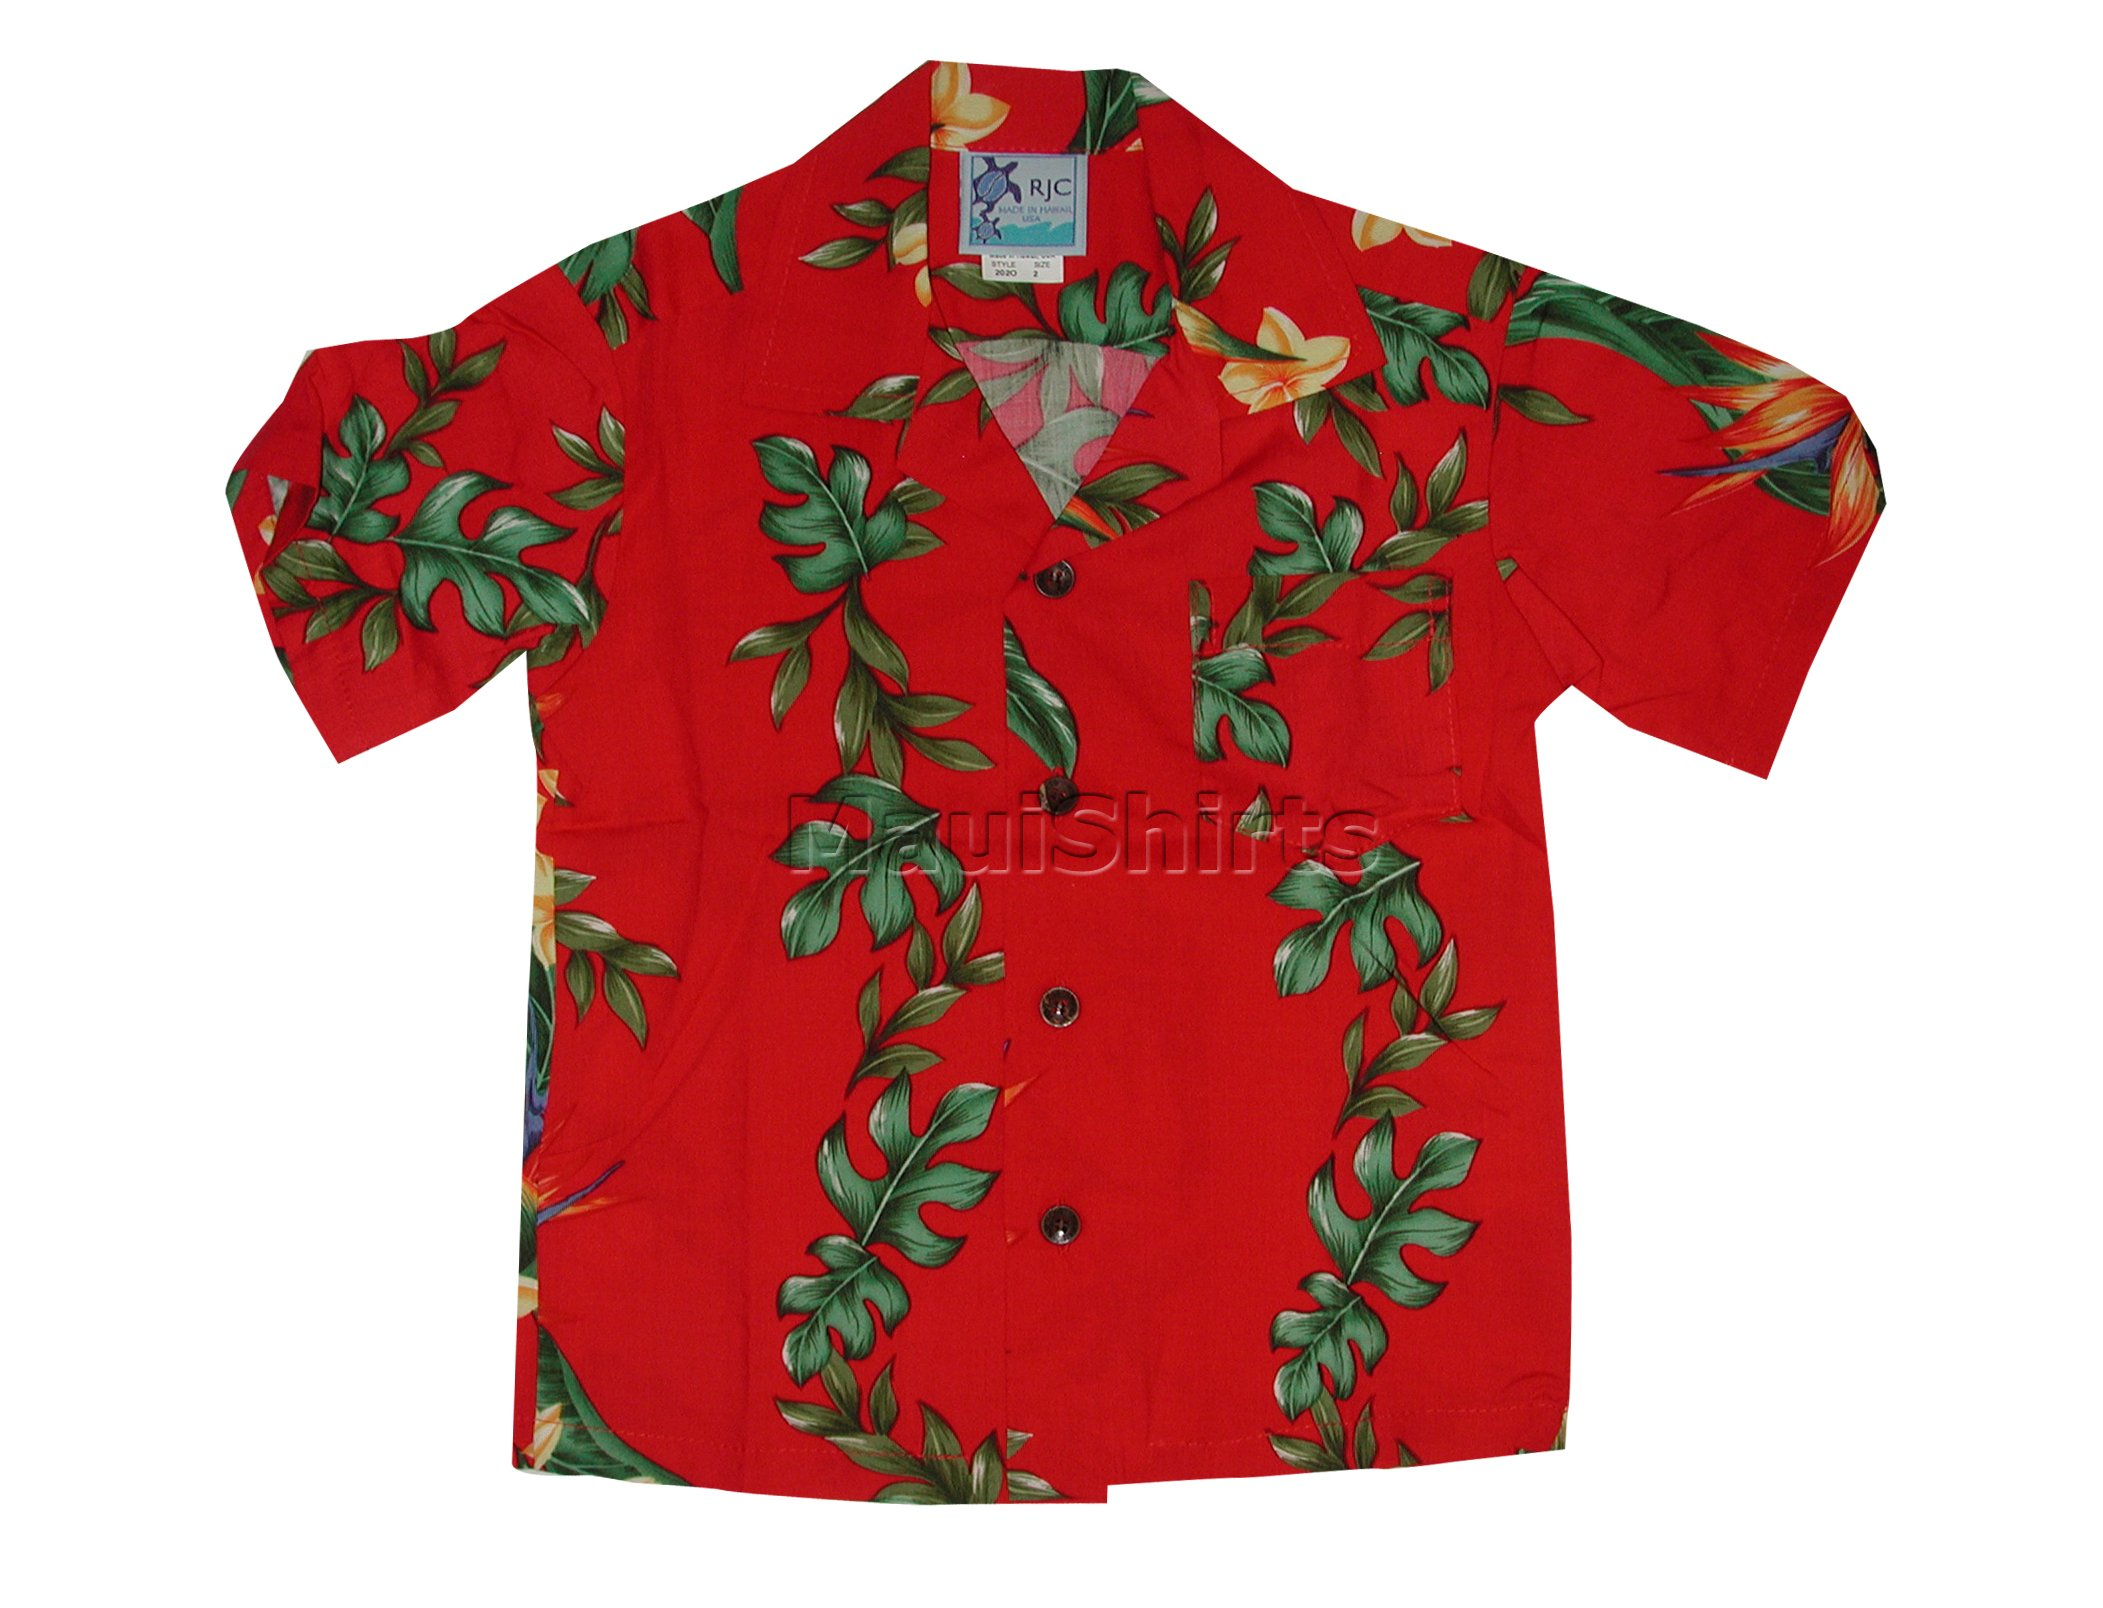 RJC Boys Island Bird of Paradise Panel Rayon Shirt Red 16 by RJC (Image #2)